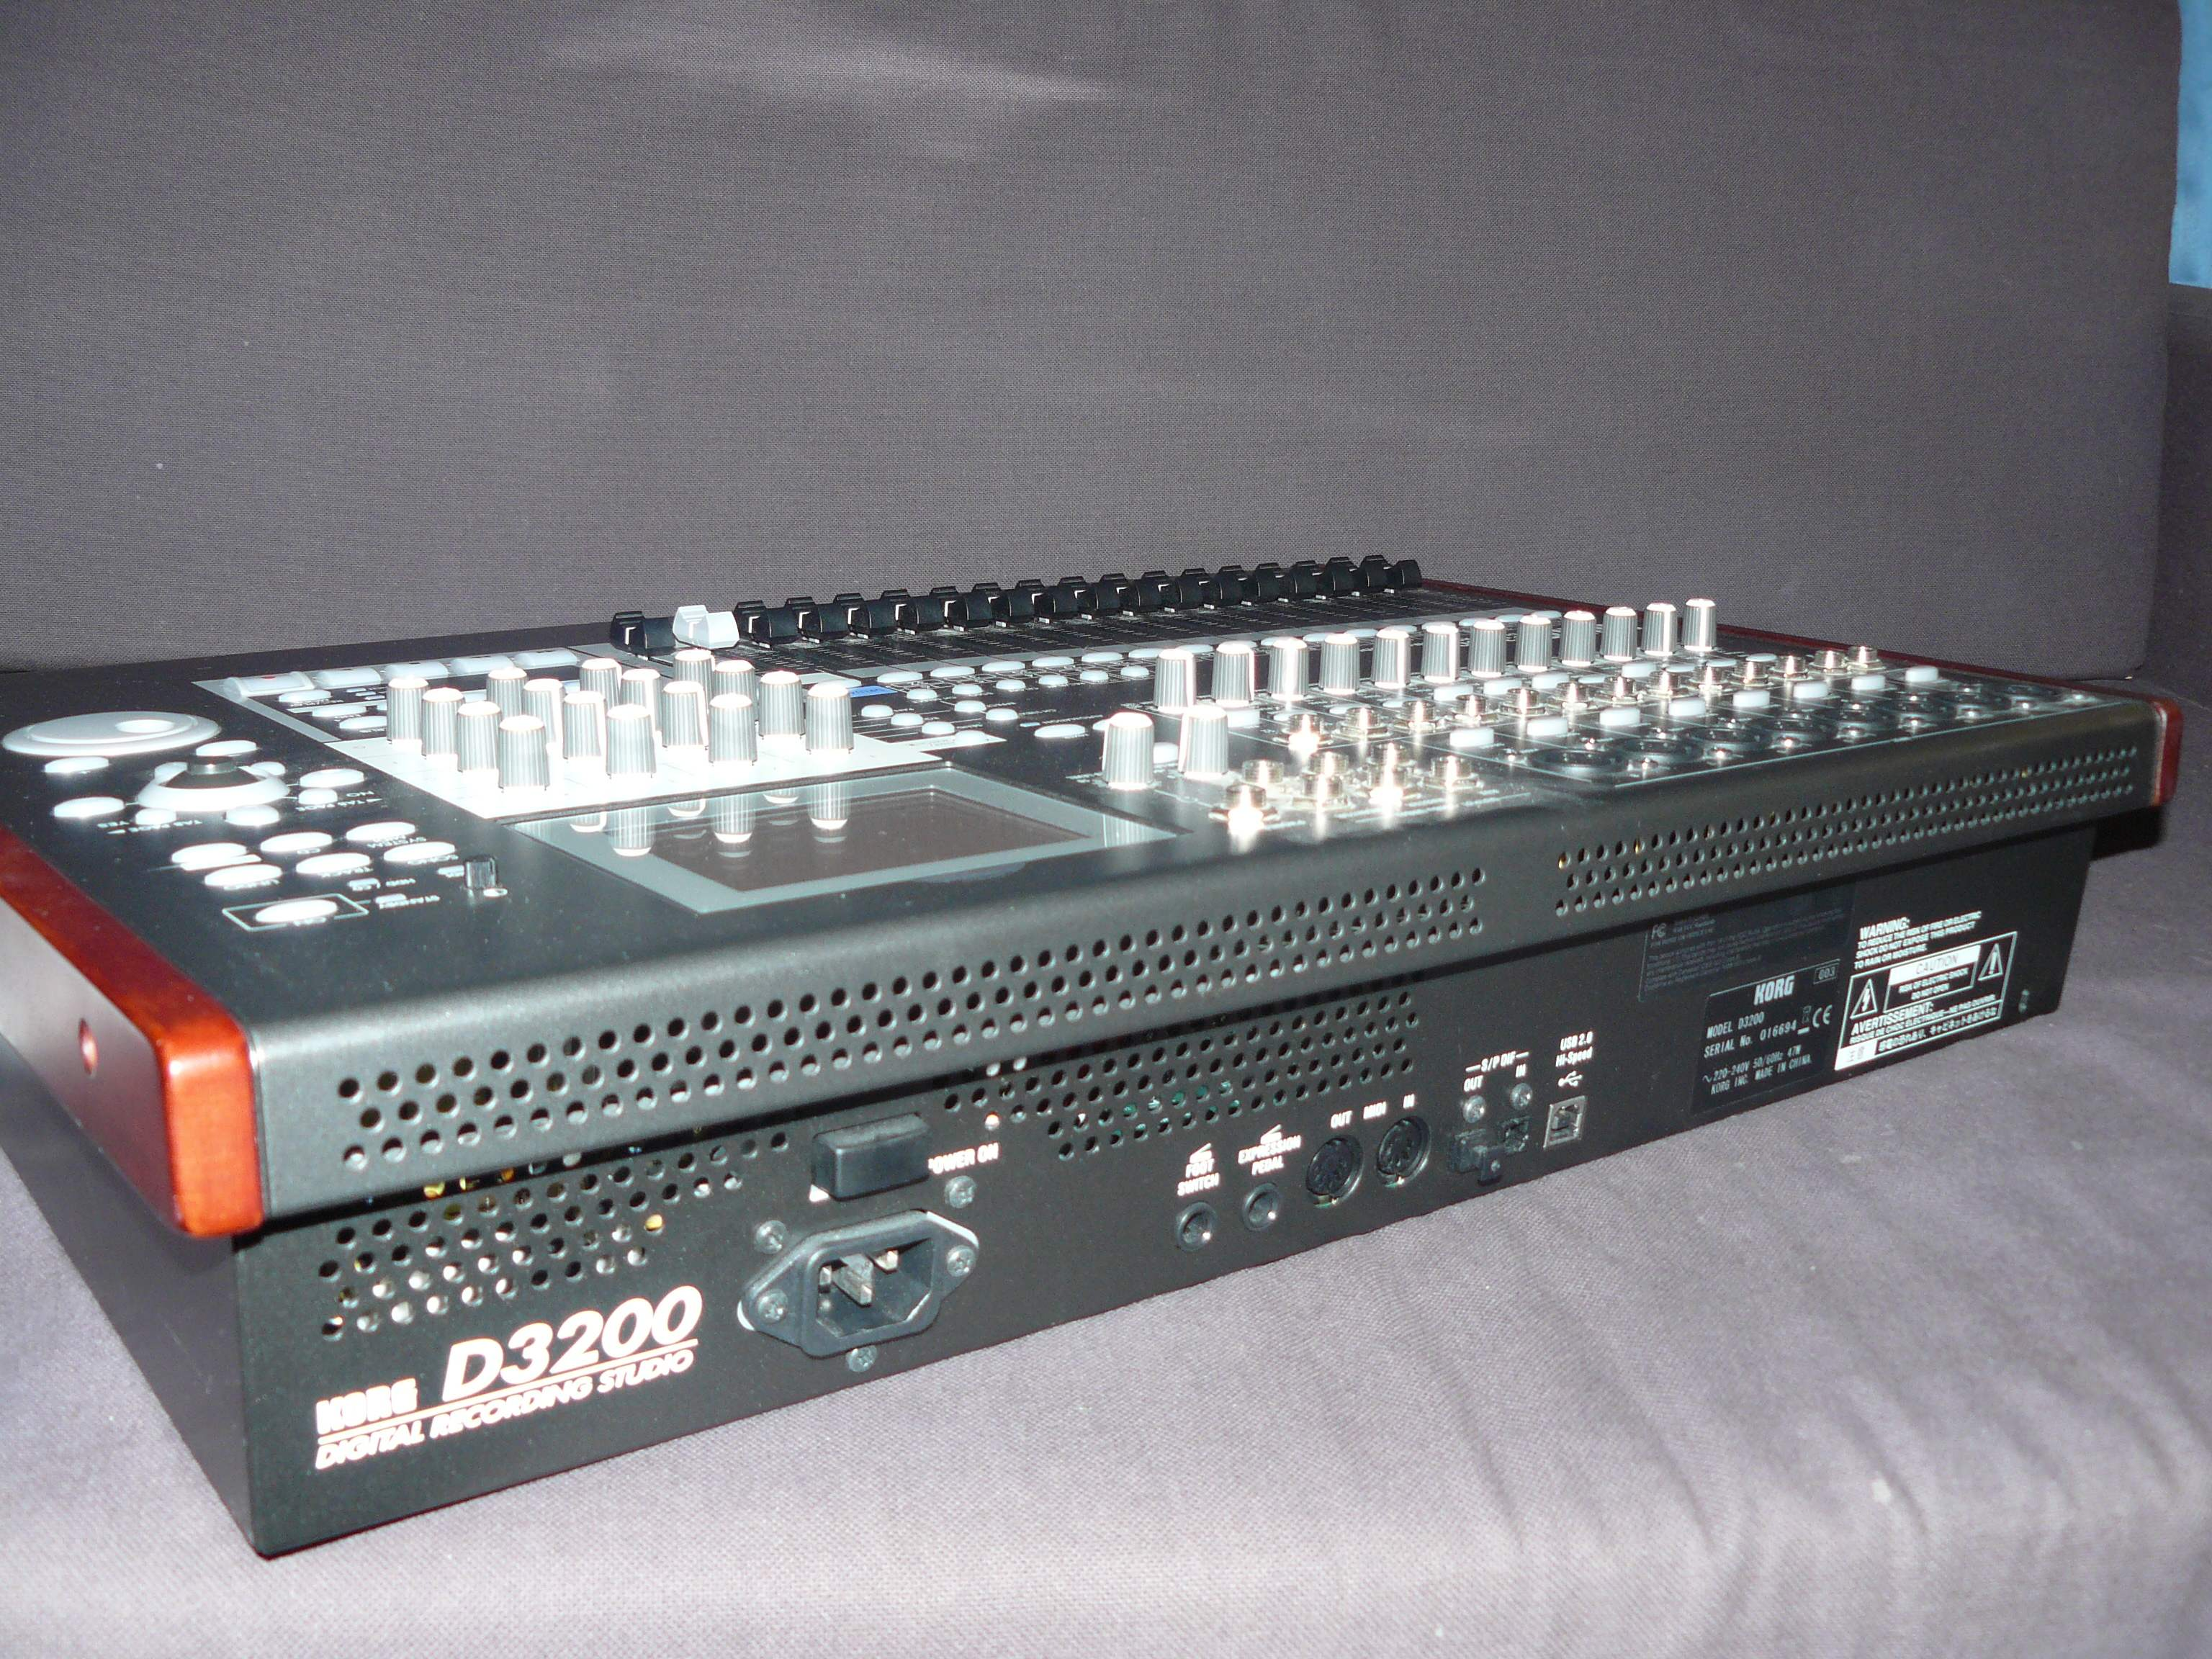 korg d3200 image 412613 audiofanzine rh en audiofanzine com nikon d3200 manual pdf nikon d3200 manual mode